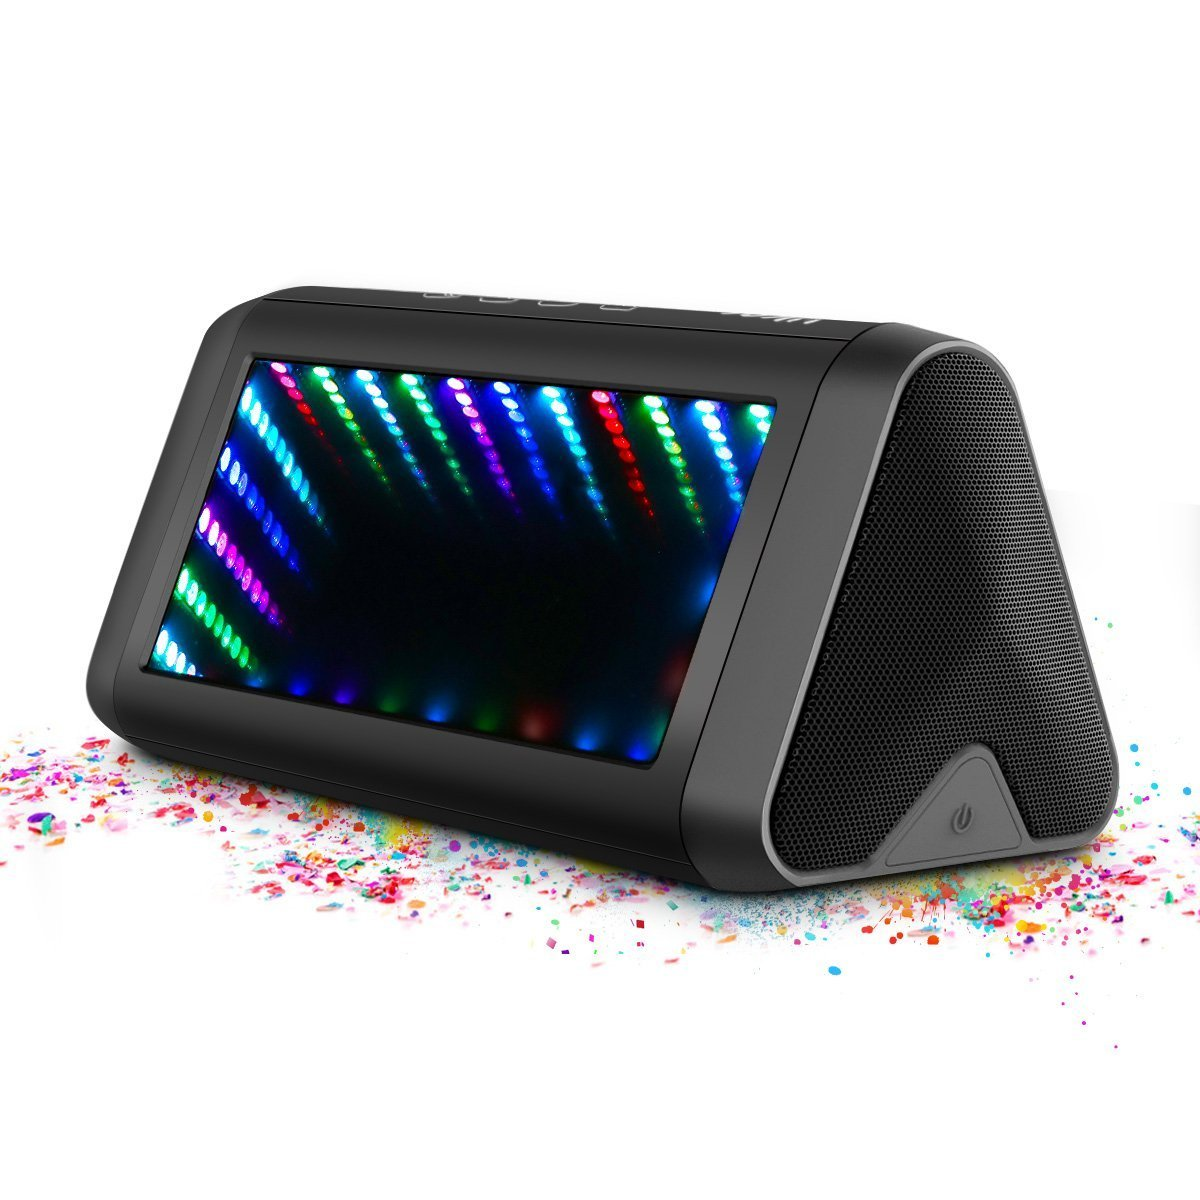 Bluetooth Lautsprecher, ELEGIANT 20W Wireless 4.0 Lautsprecher LED Stereo Boombox Kabellos Boxen tragbarer wasserdichter